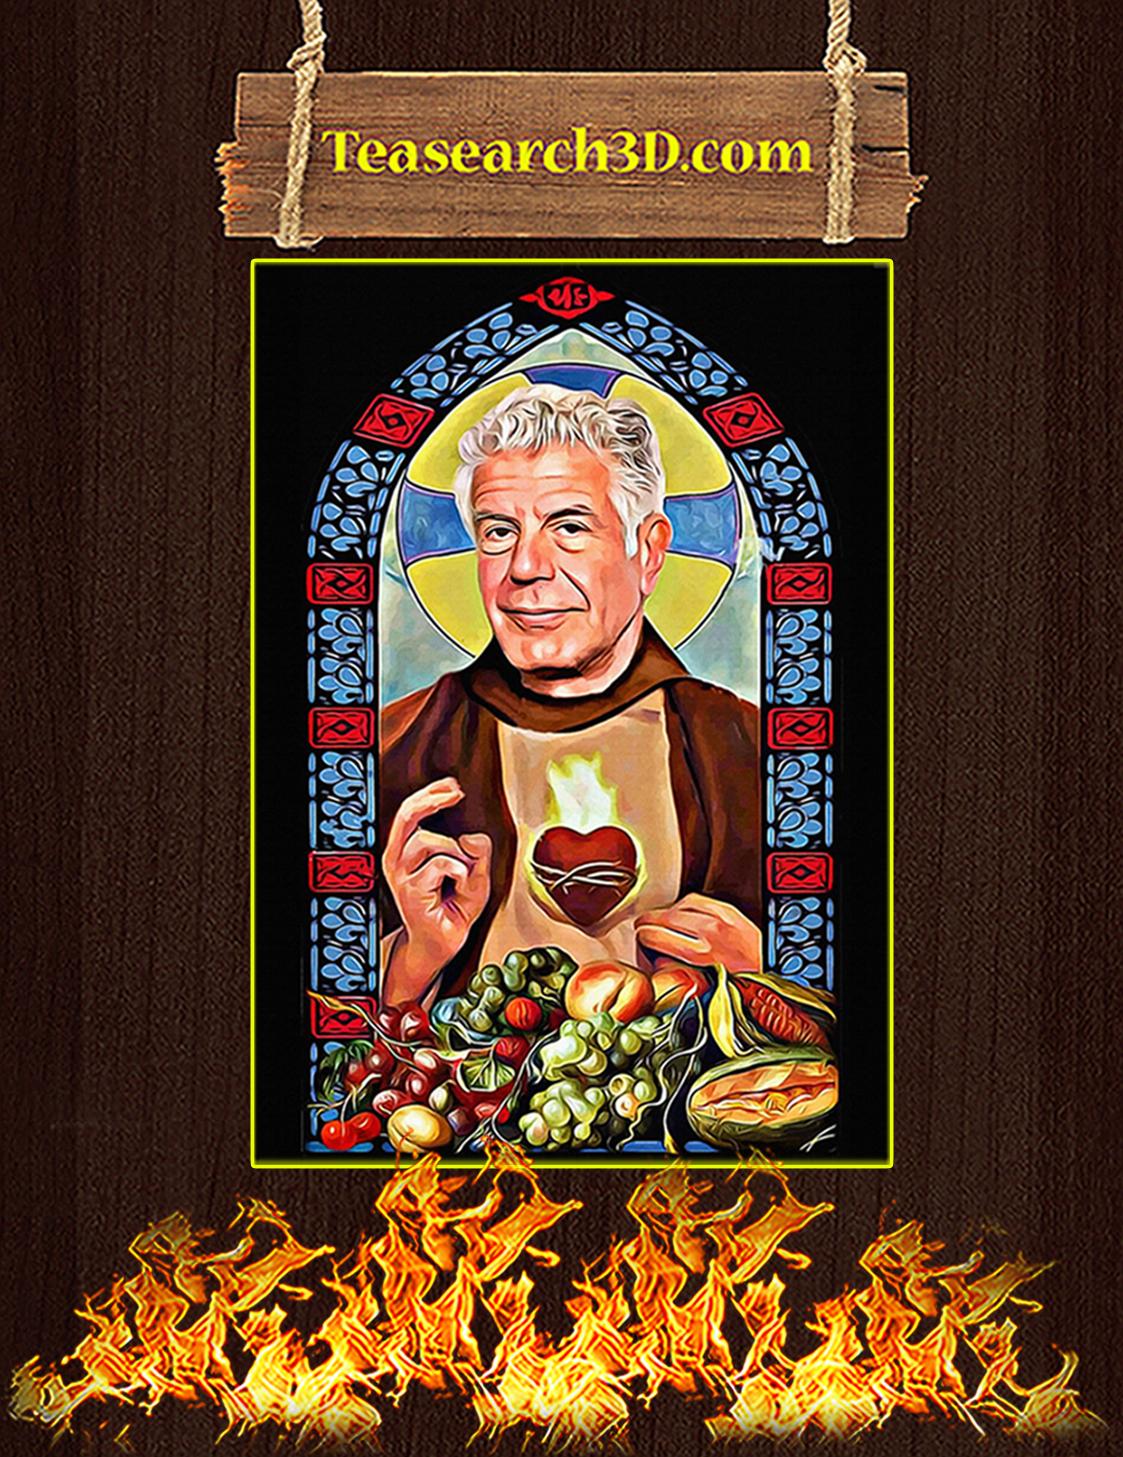 Patron saint of food and life prayer poster A3